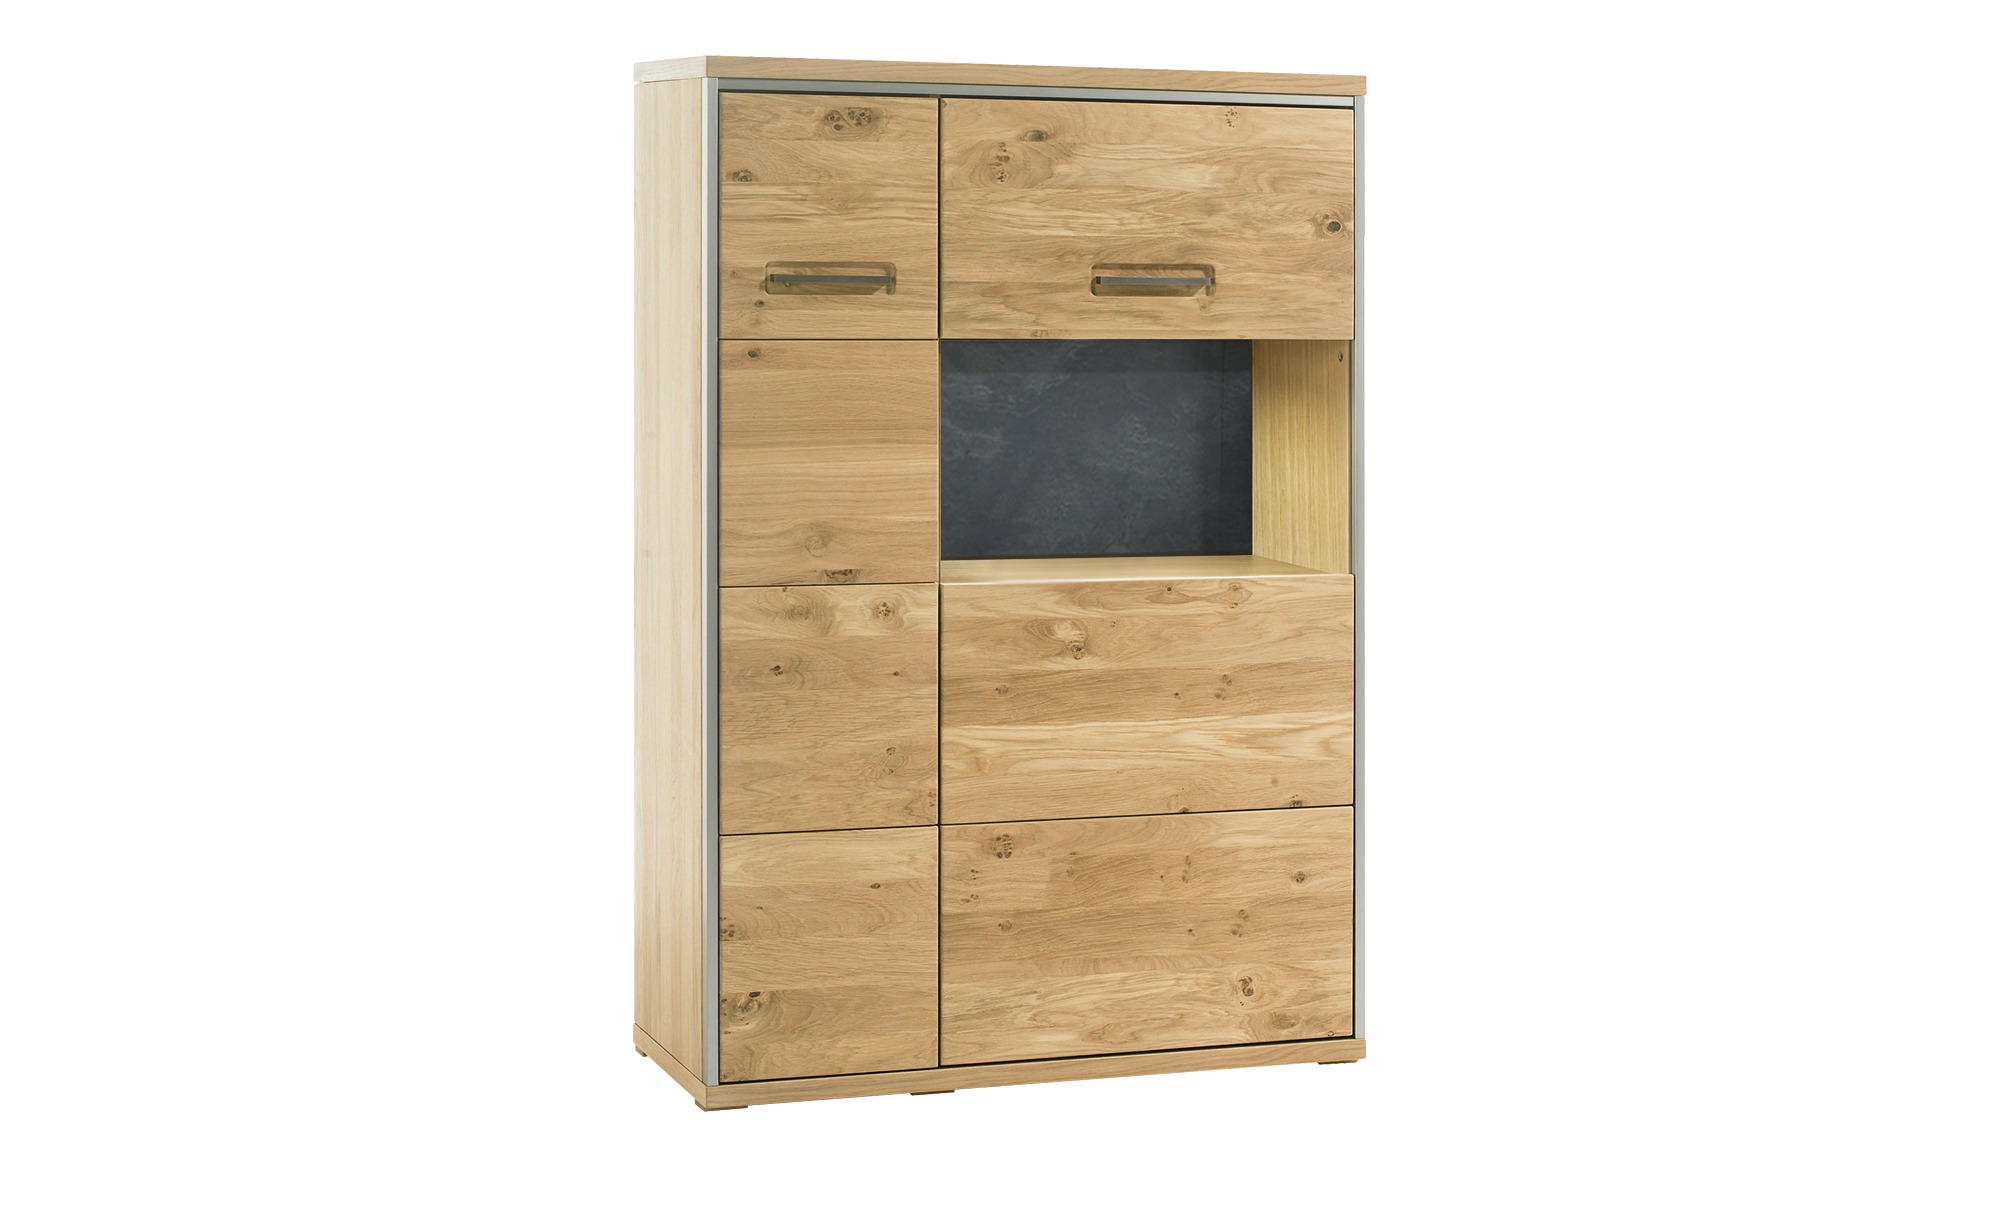 Woodford Kombi-Highboard  Felino ¦ holzfarben ¦ Maße (cm): B: 94 H: 136 T: 39 Kommoden & Sideboards > Highboards - Höffner